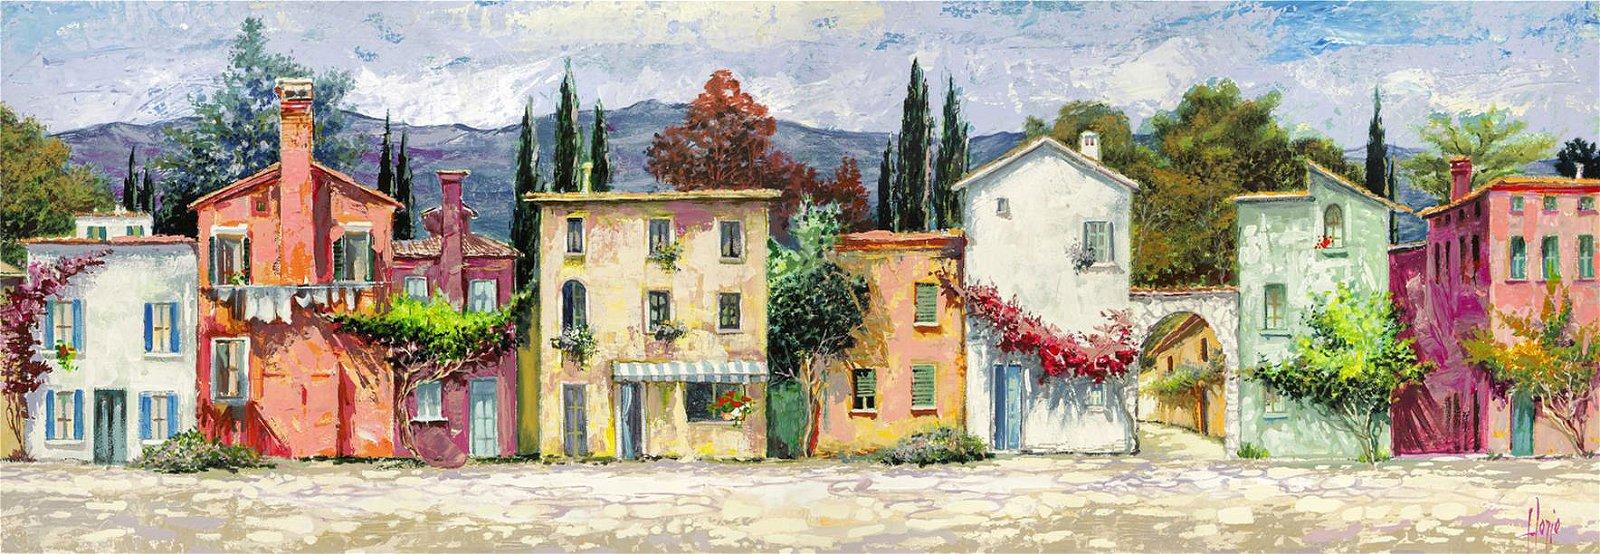 Cuadro canvas paese italiano